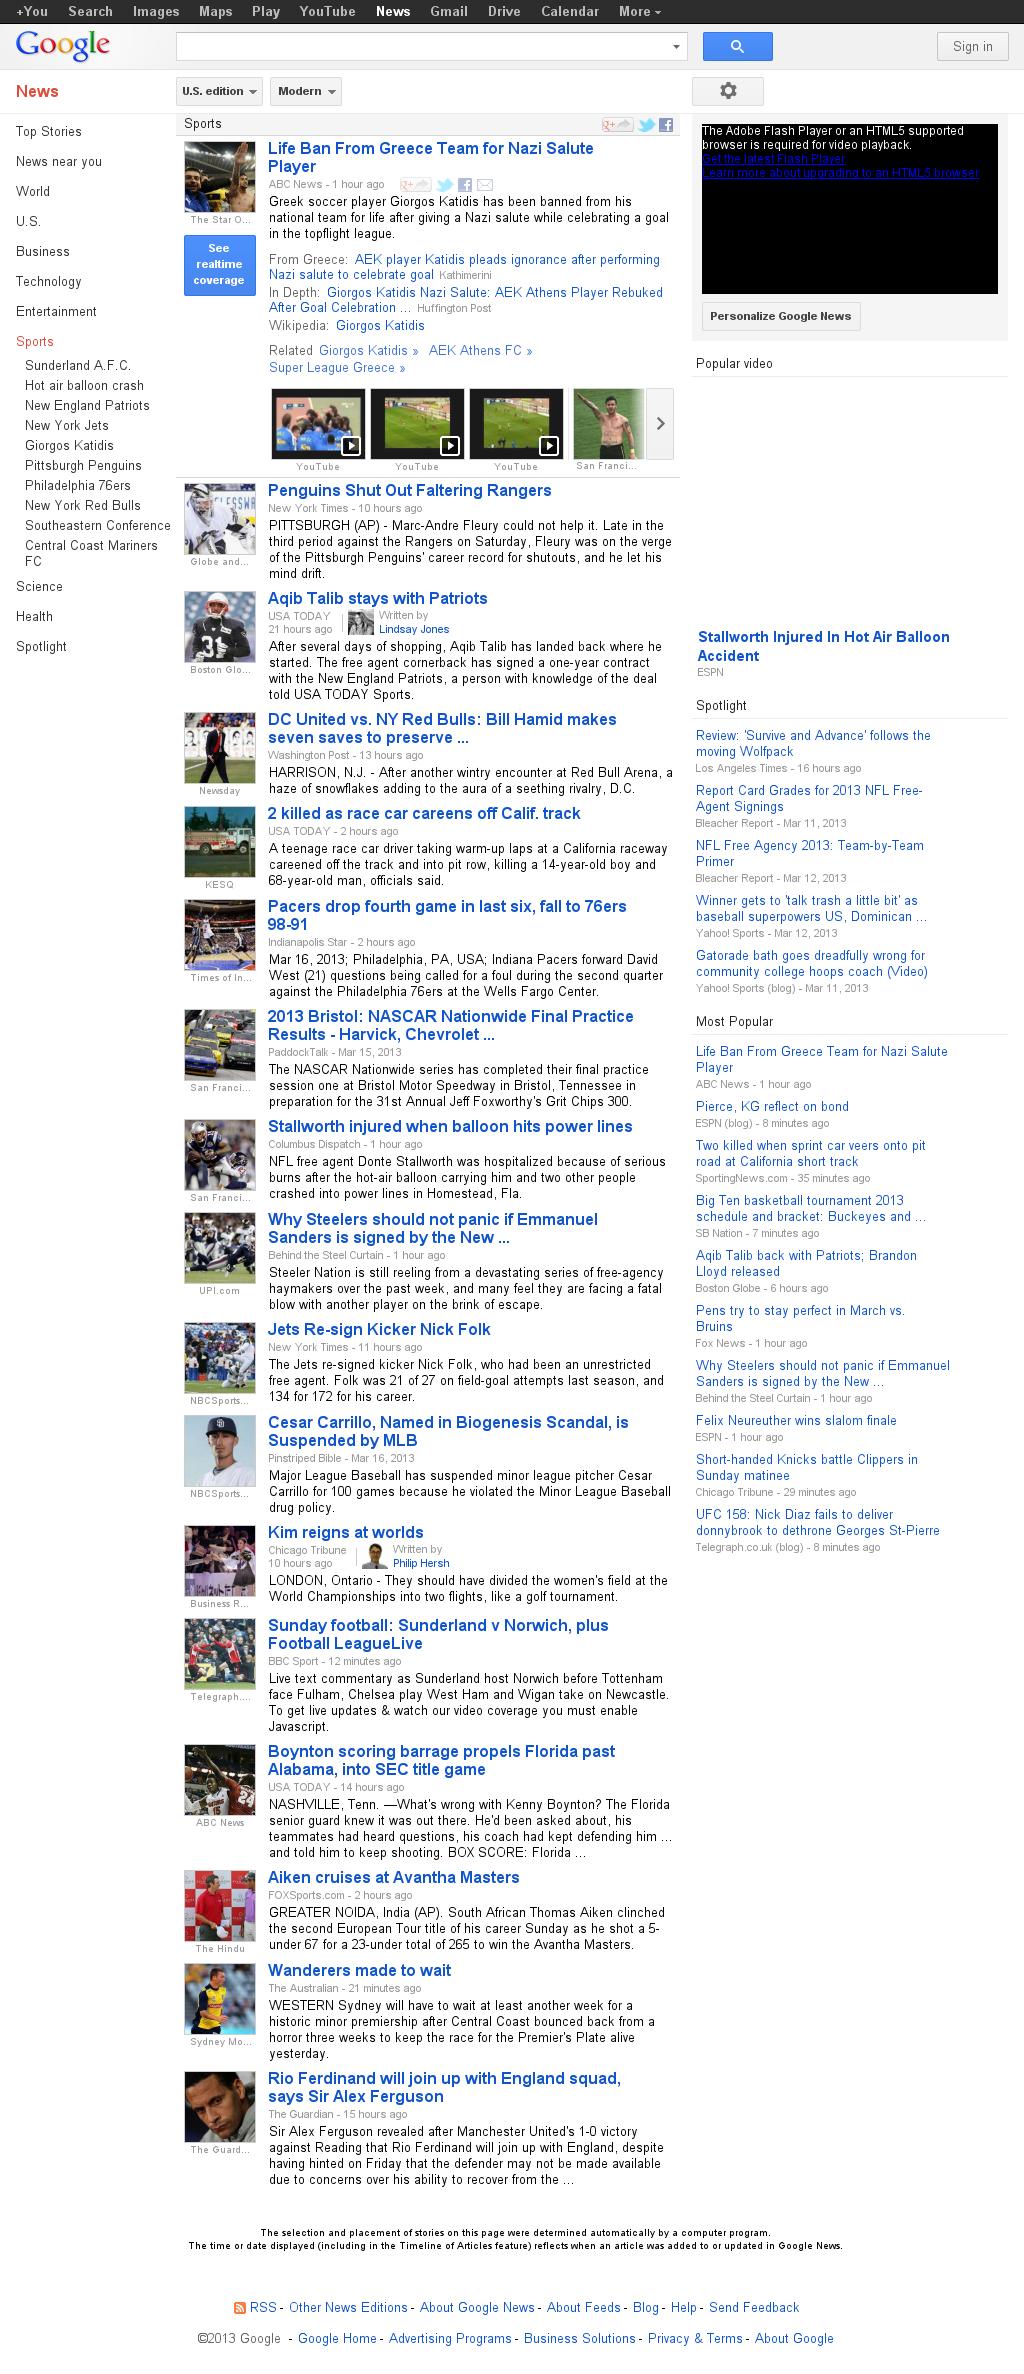 Google News: Sports at Sunday March 17, 2013, 2:11 p.m. UTC